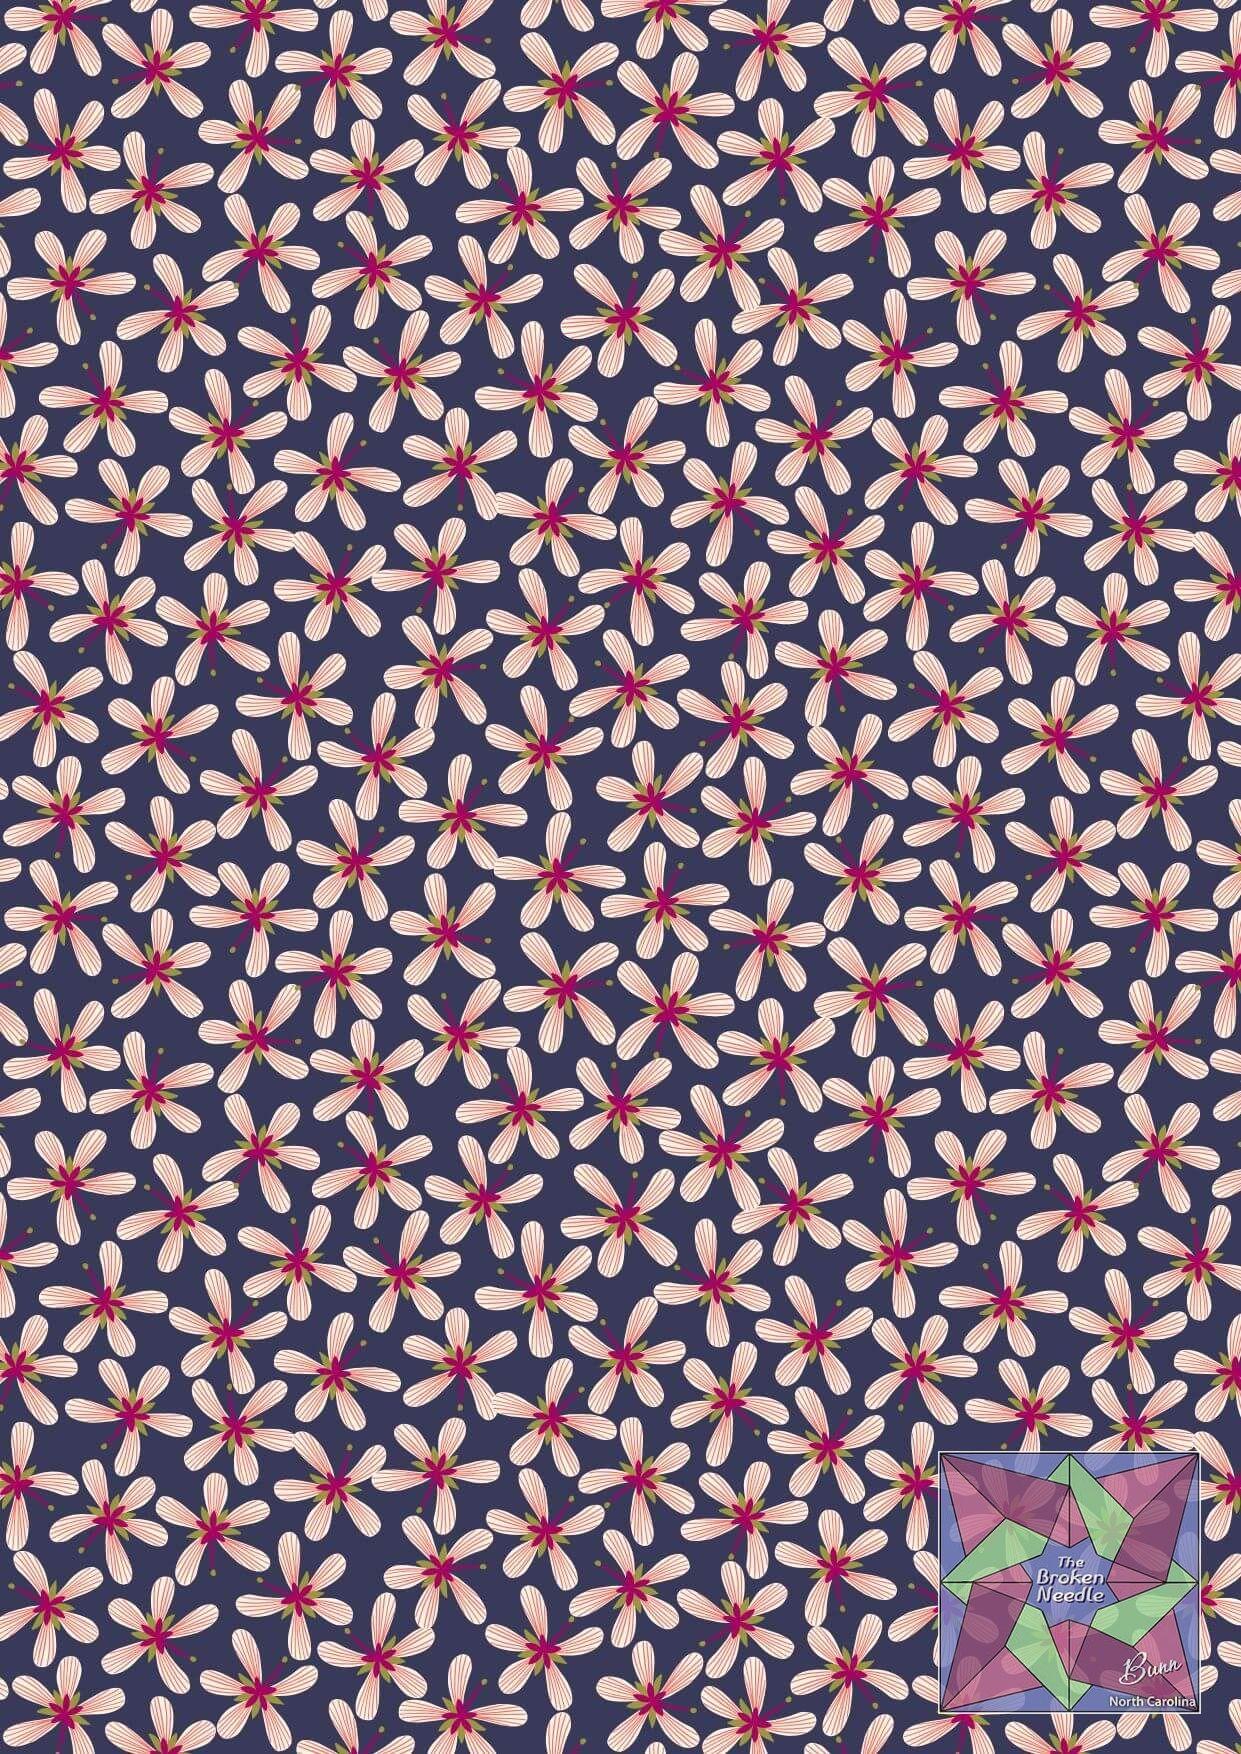 Lewis & Irene - Stripy Flowers on Dark Blue- A433.3